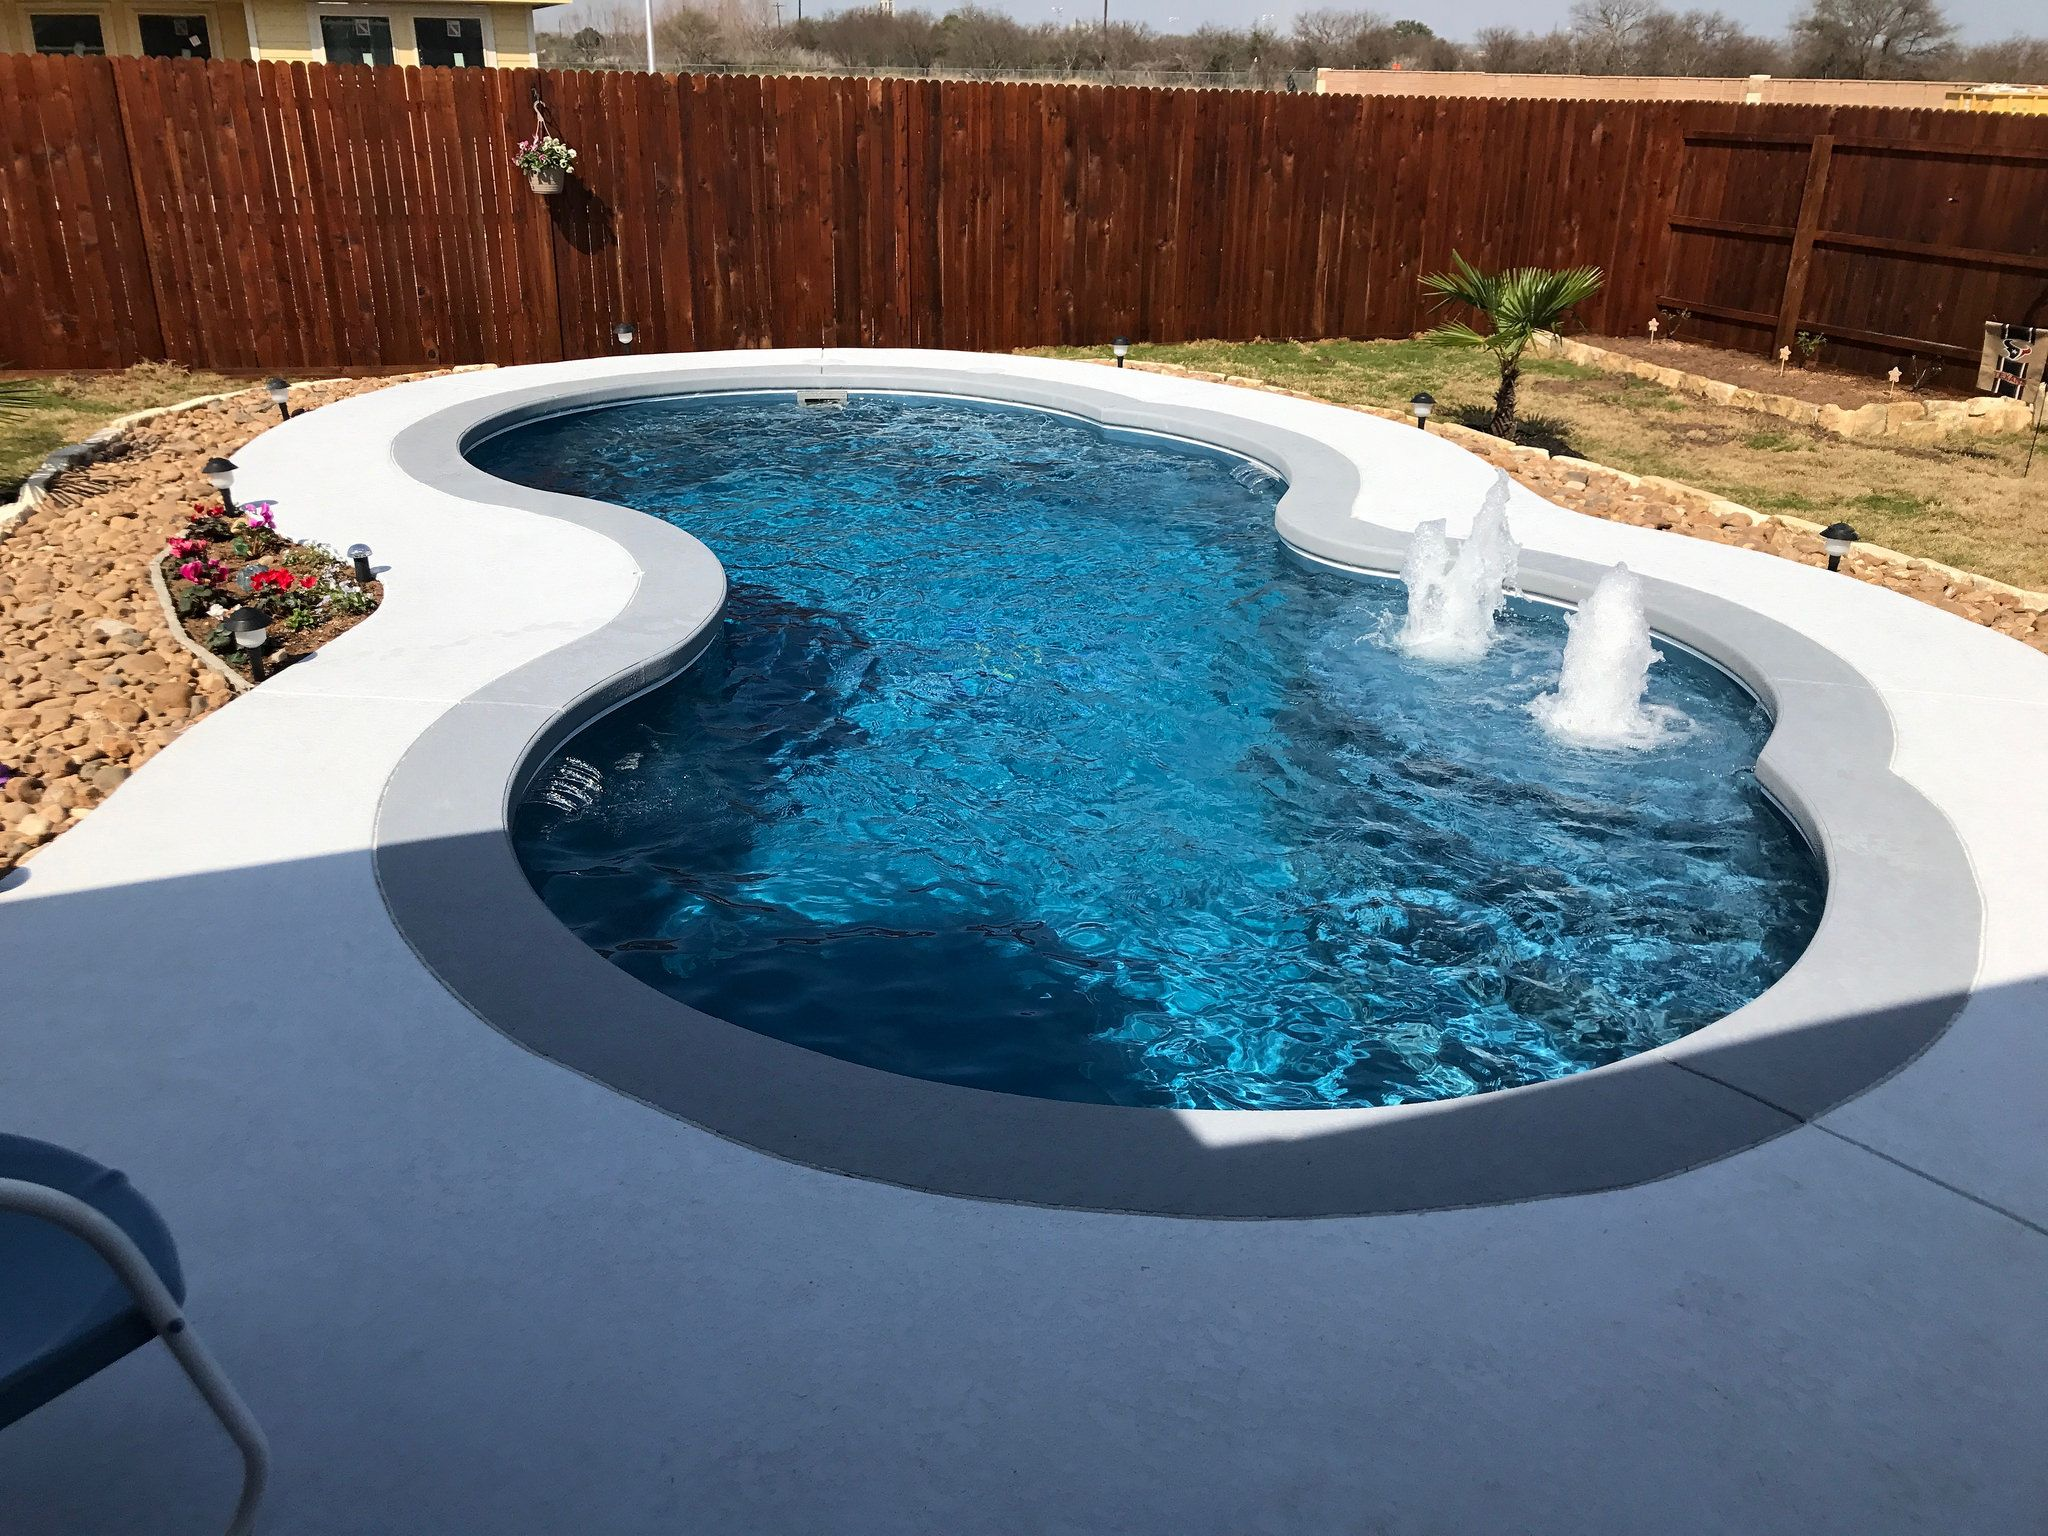 Picasso Pools Backyard Inground Small Pools Backyard Small Backyard Pools